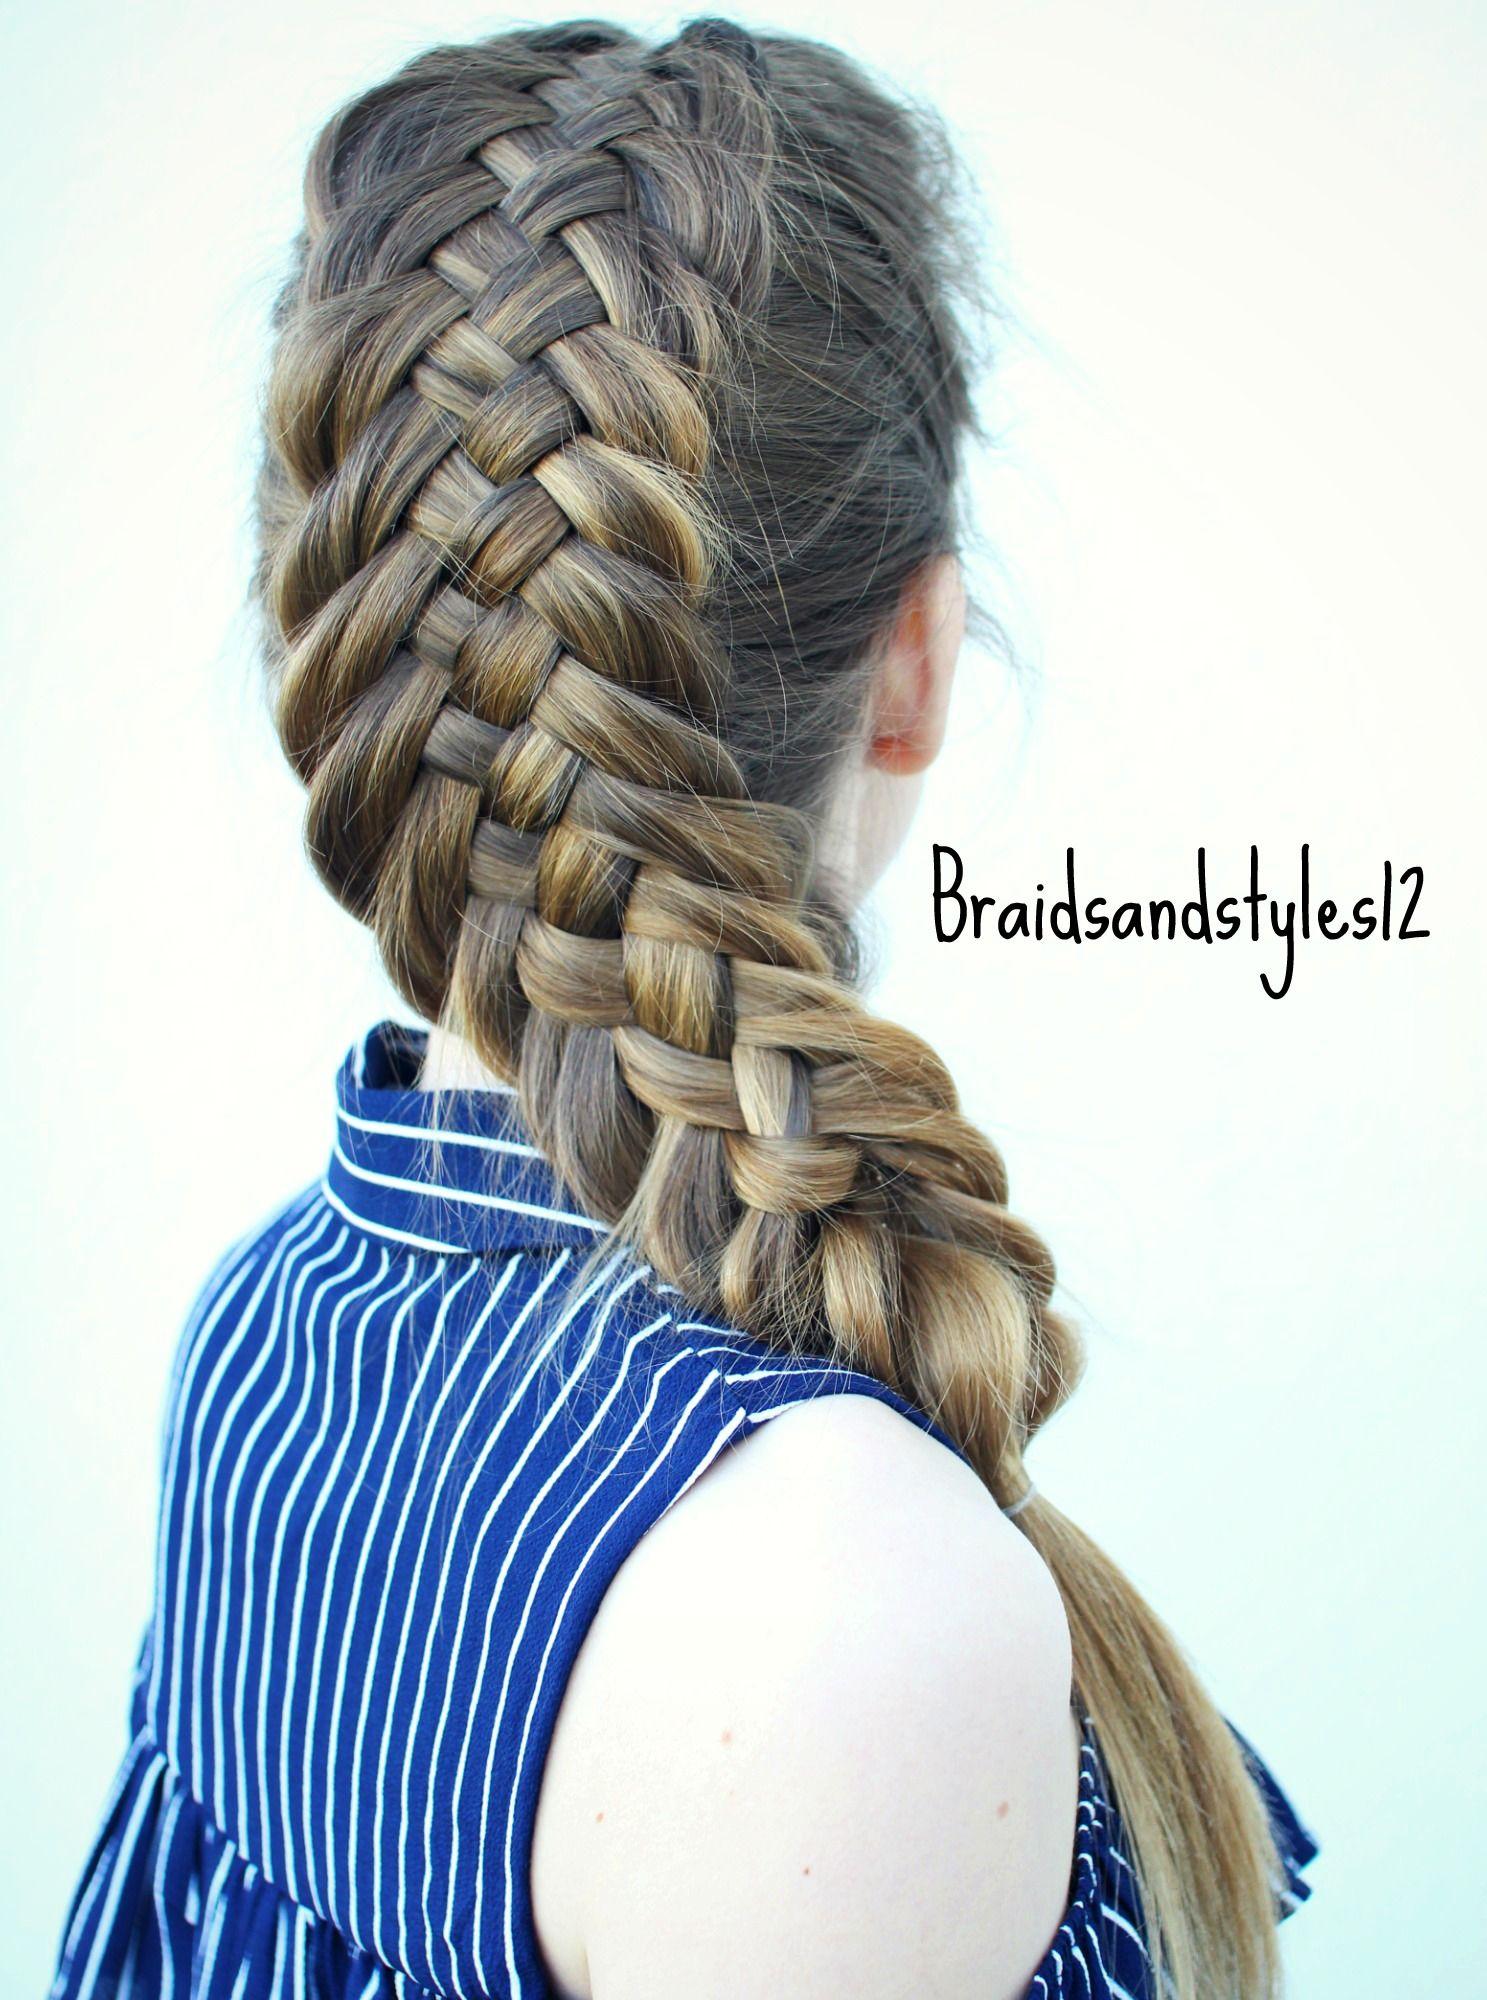 Diy Woven Fishtail Braid By Braidsandstyles12 Youtube Braidsandstyles12 Fish Tail Braid Hair Styles Kids Braided Hairstyles